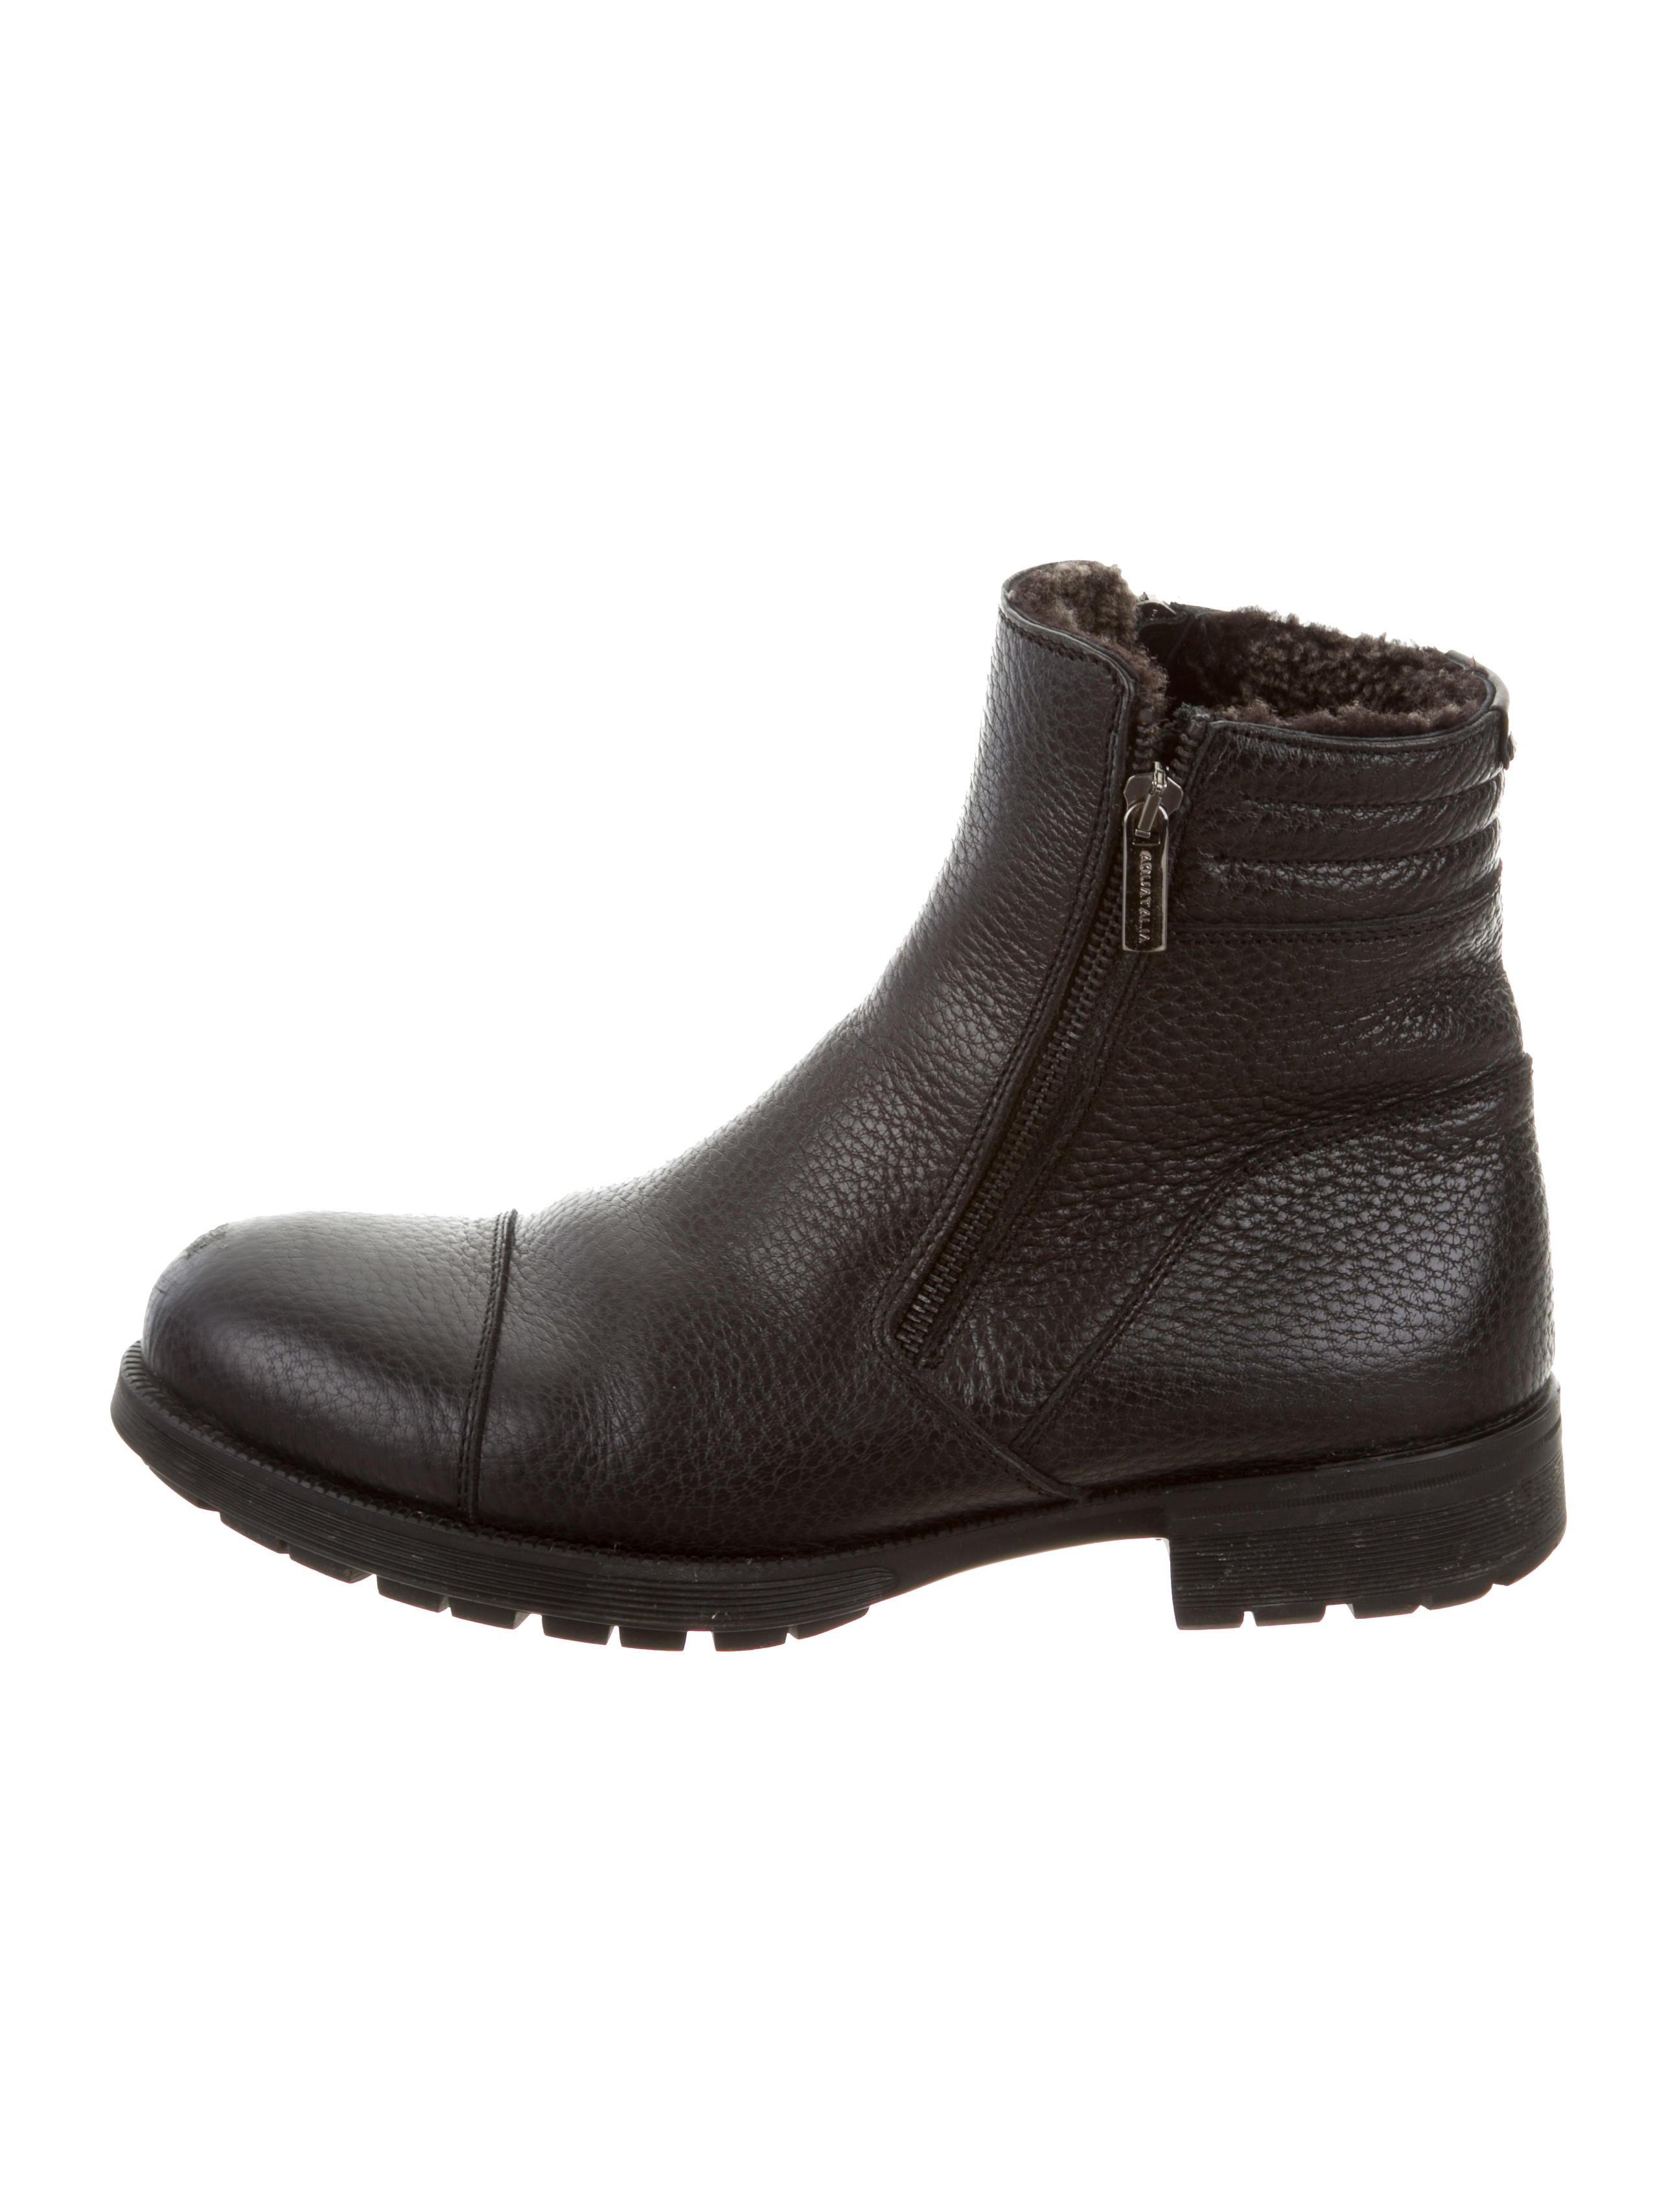 aquatalia leather zip ankle boots shoes waqtl20187